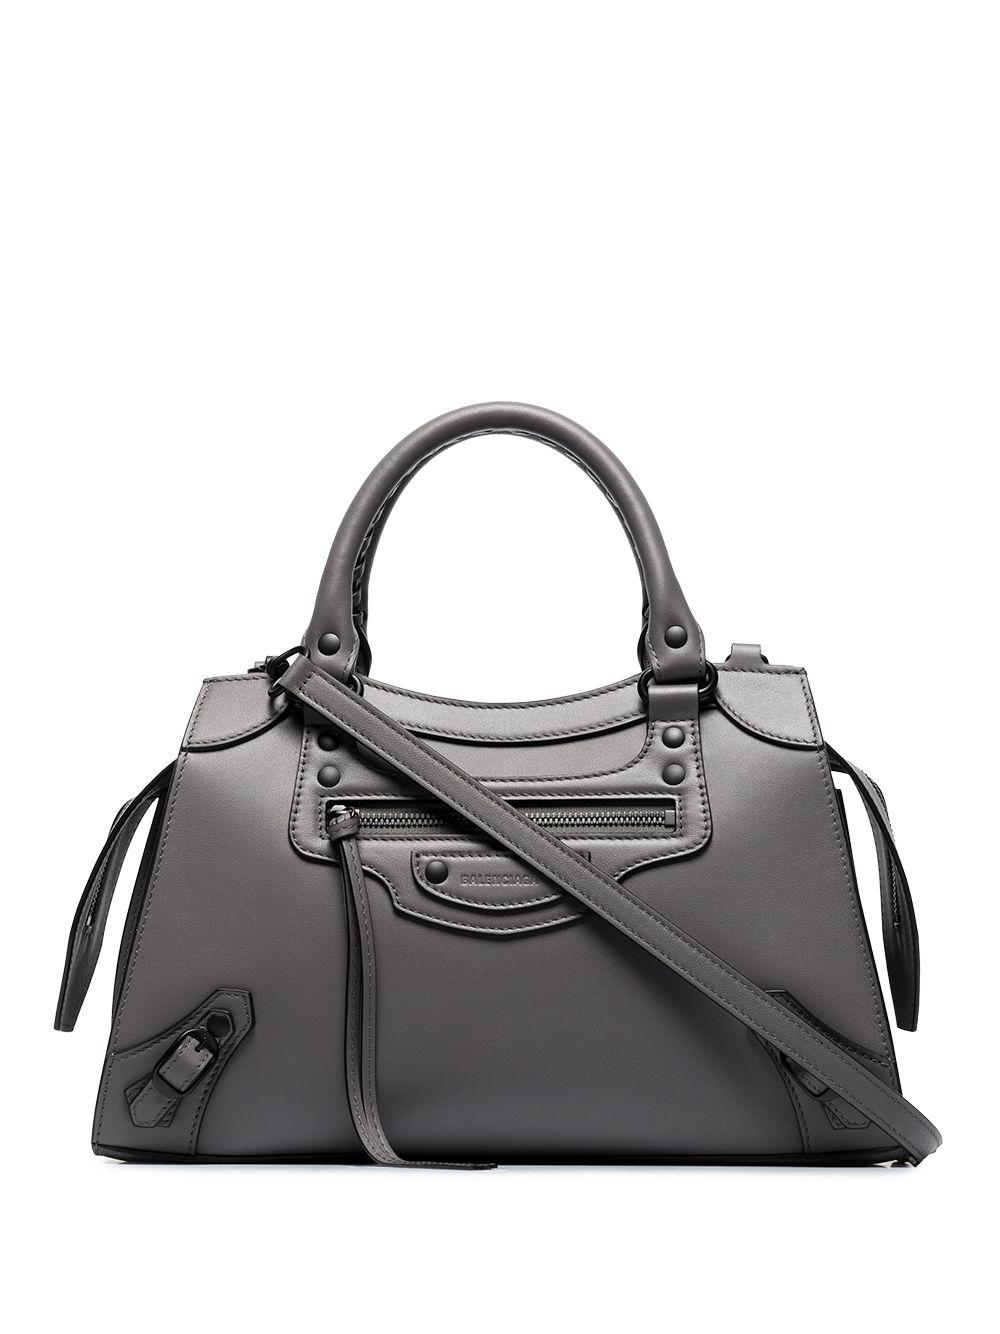 Neo Class City Leather Handbag